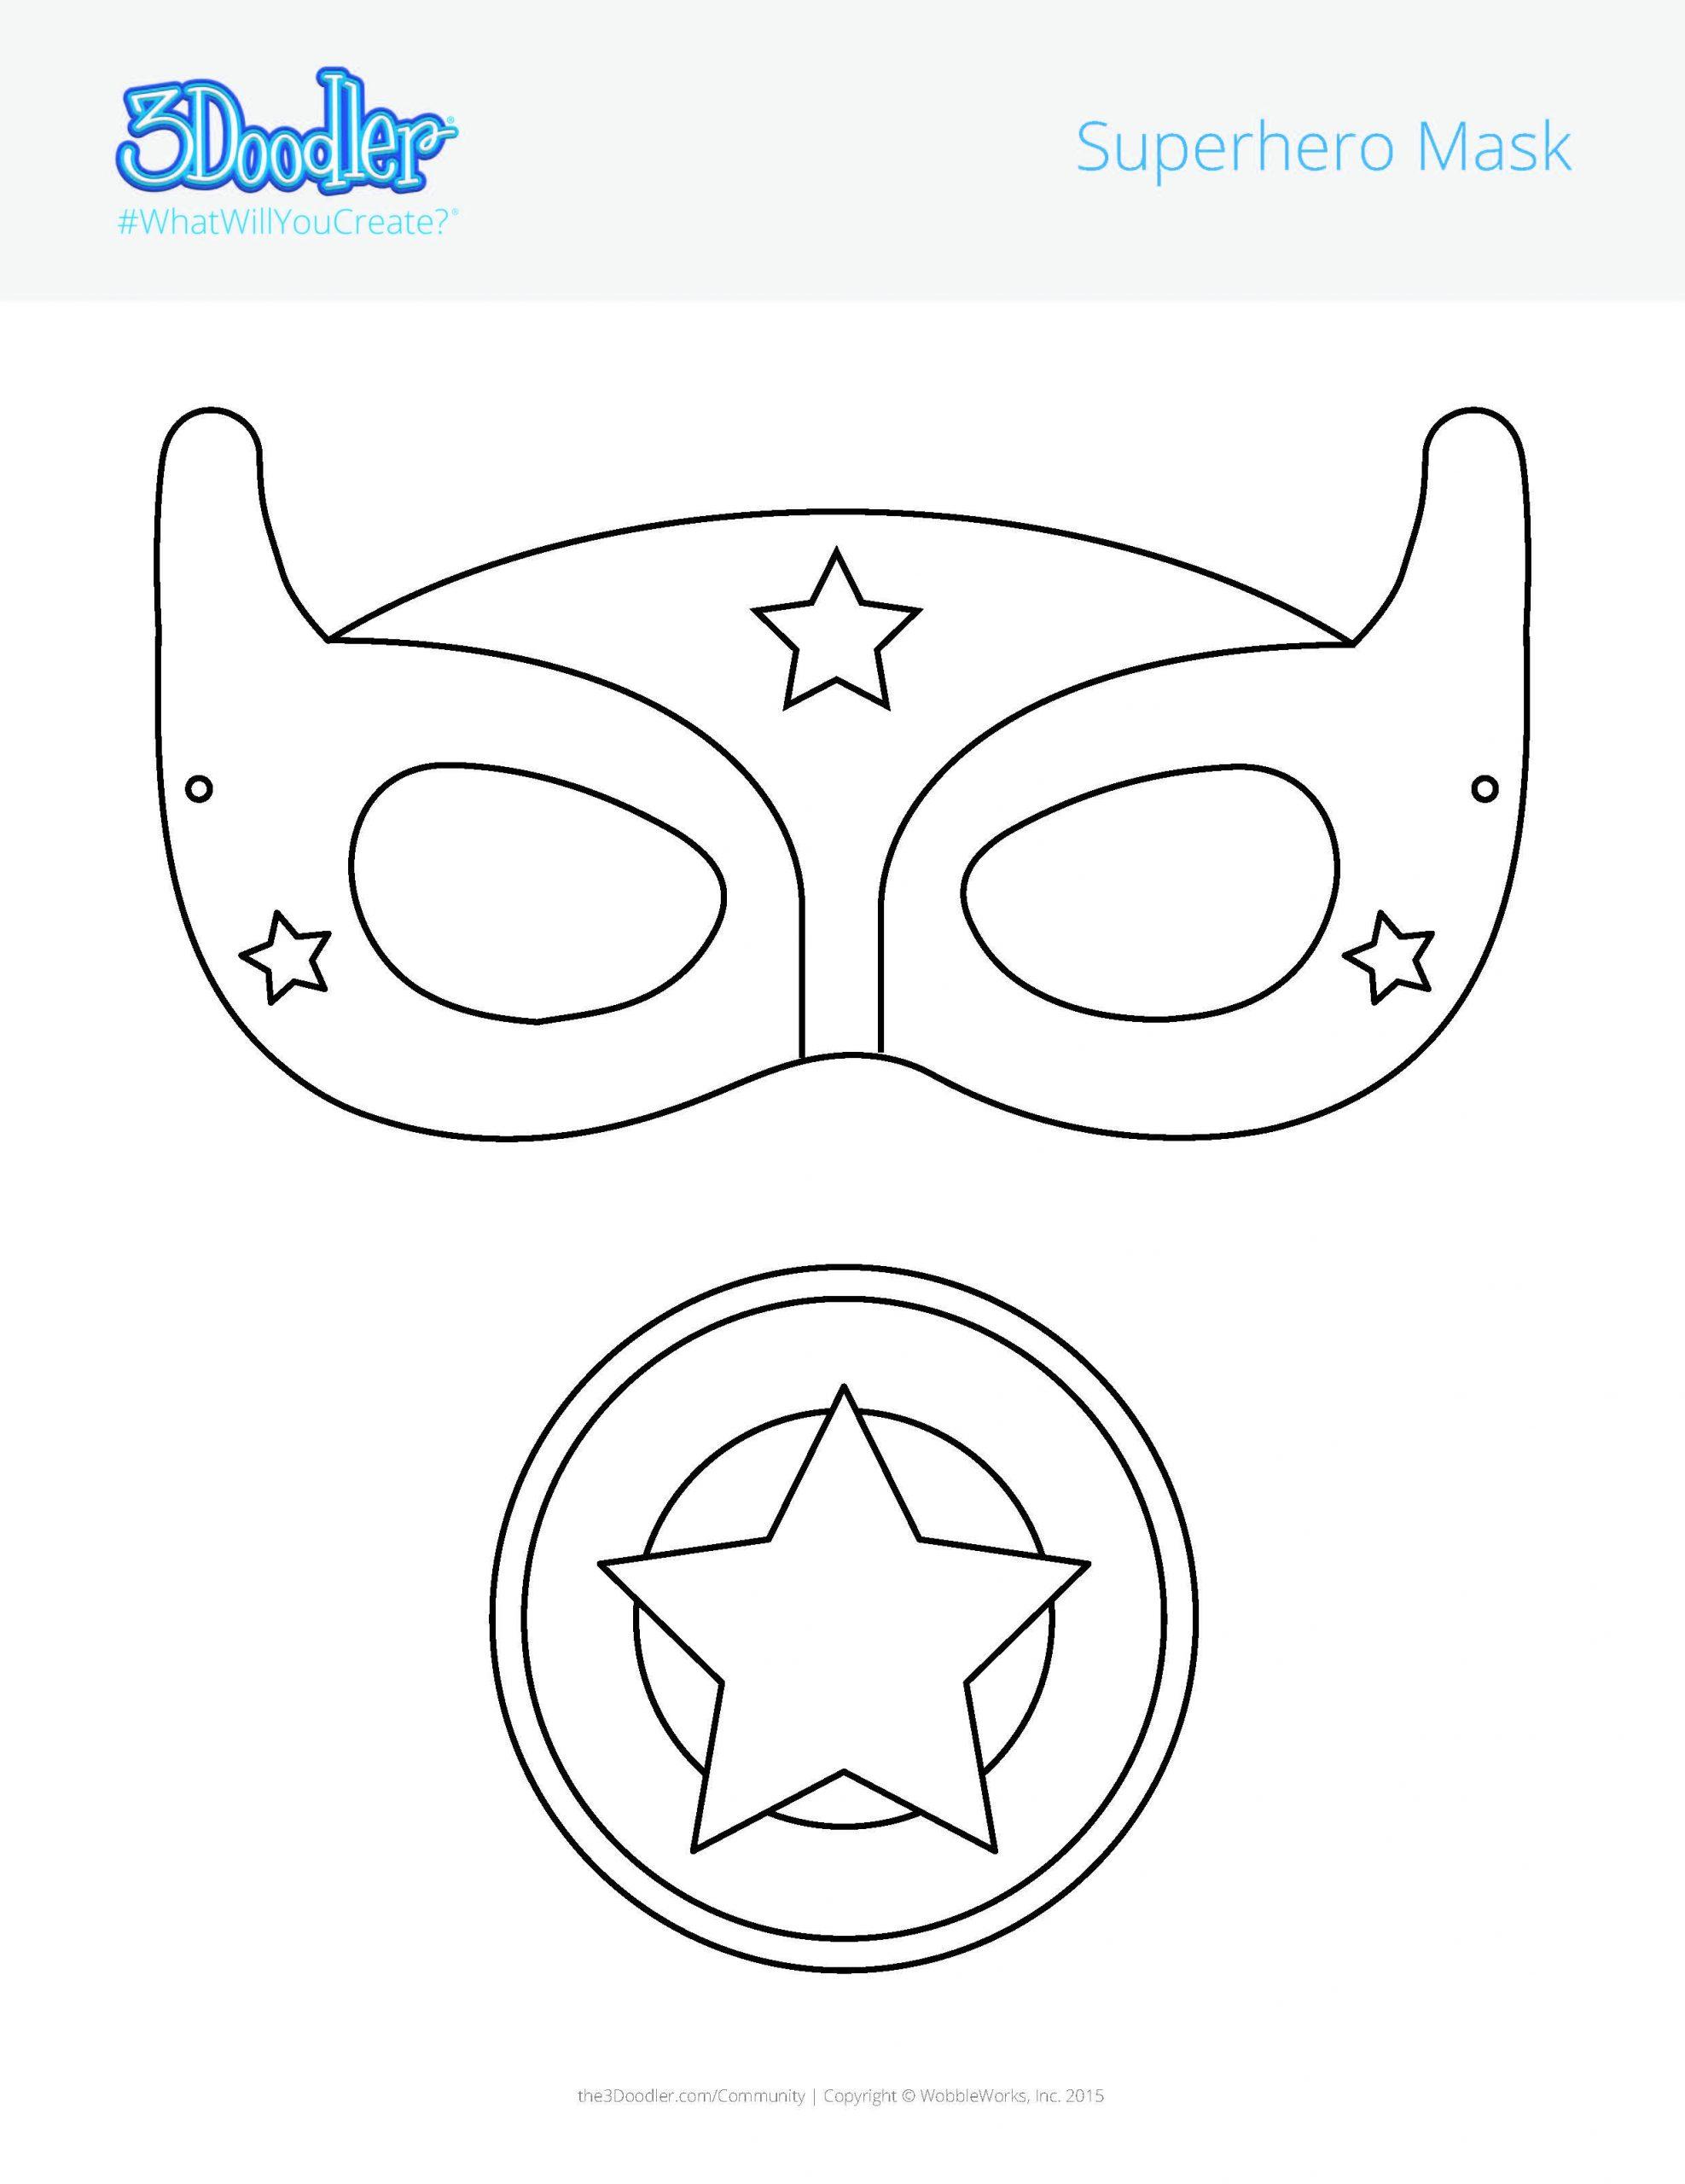 3D Pen Stencil Template Superhero Mask